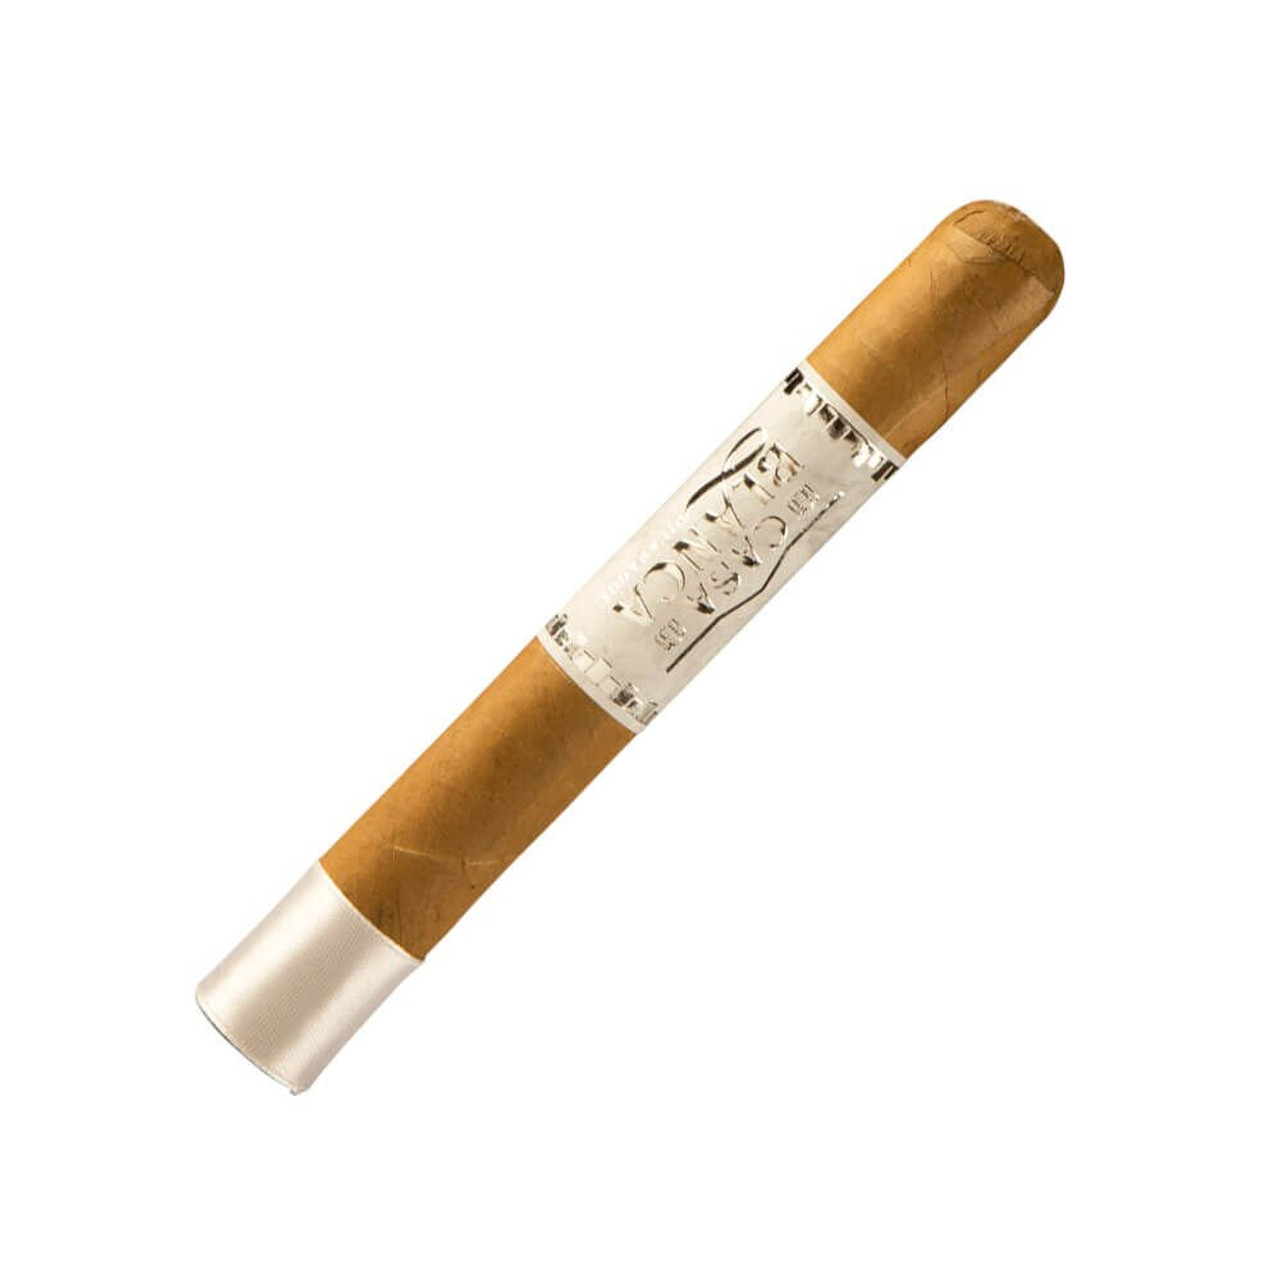 Casa Blanca Nicaragua De Luxe Natural Cigars - 6 x 50 (Pack of 5)